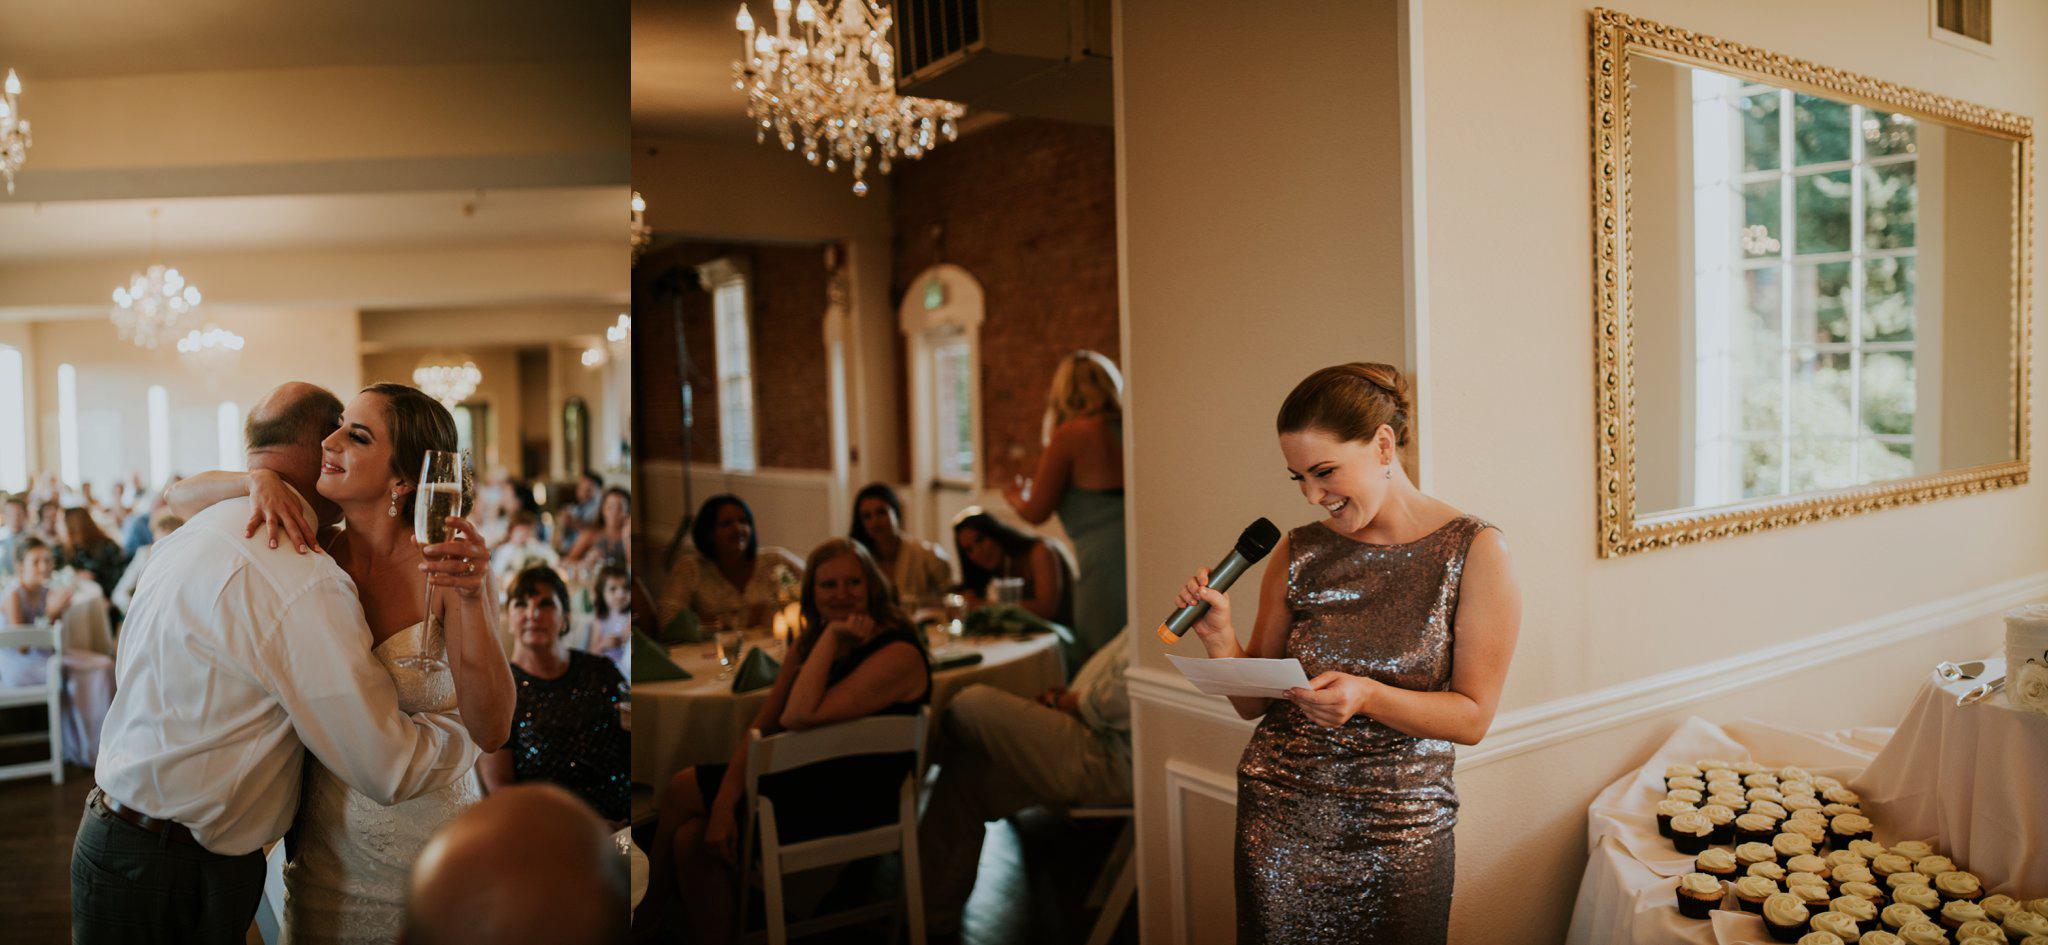 hollywood-school-house-wedding-seattle-photographer-caitlyn-nikula-101.jpg